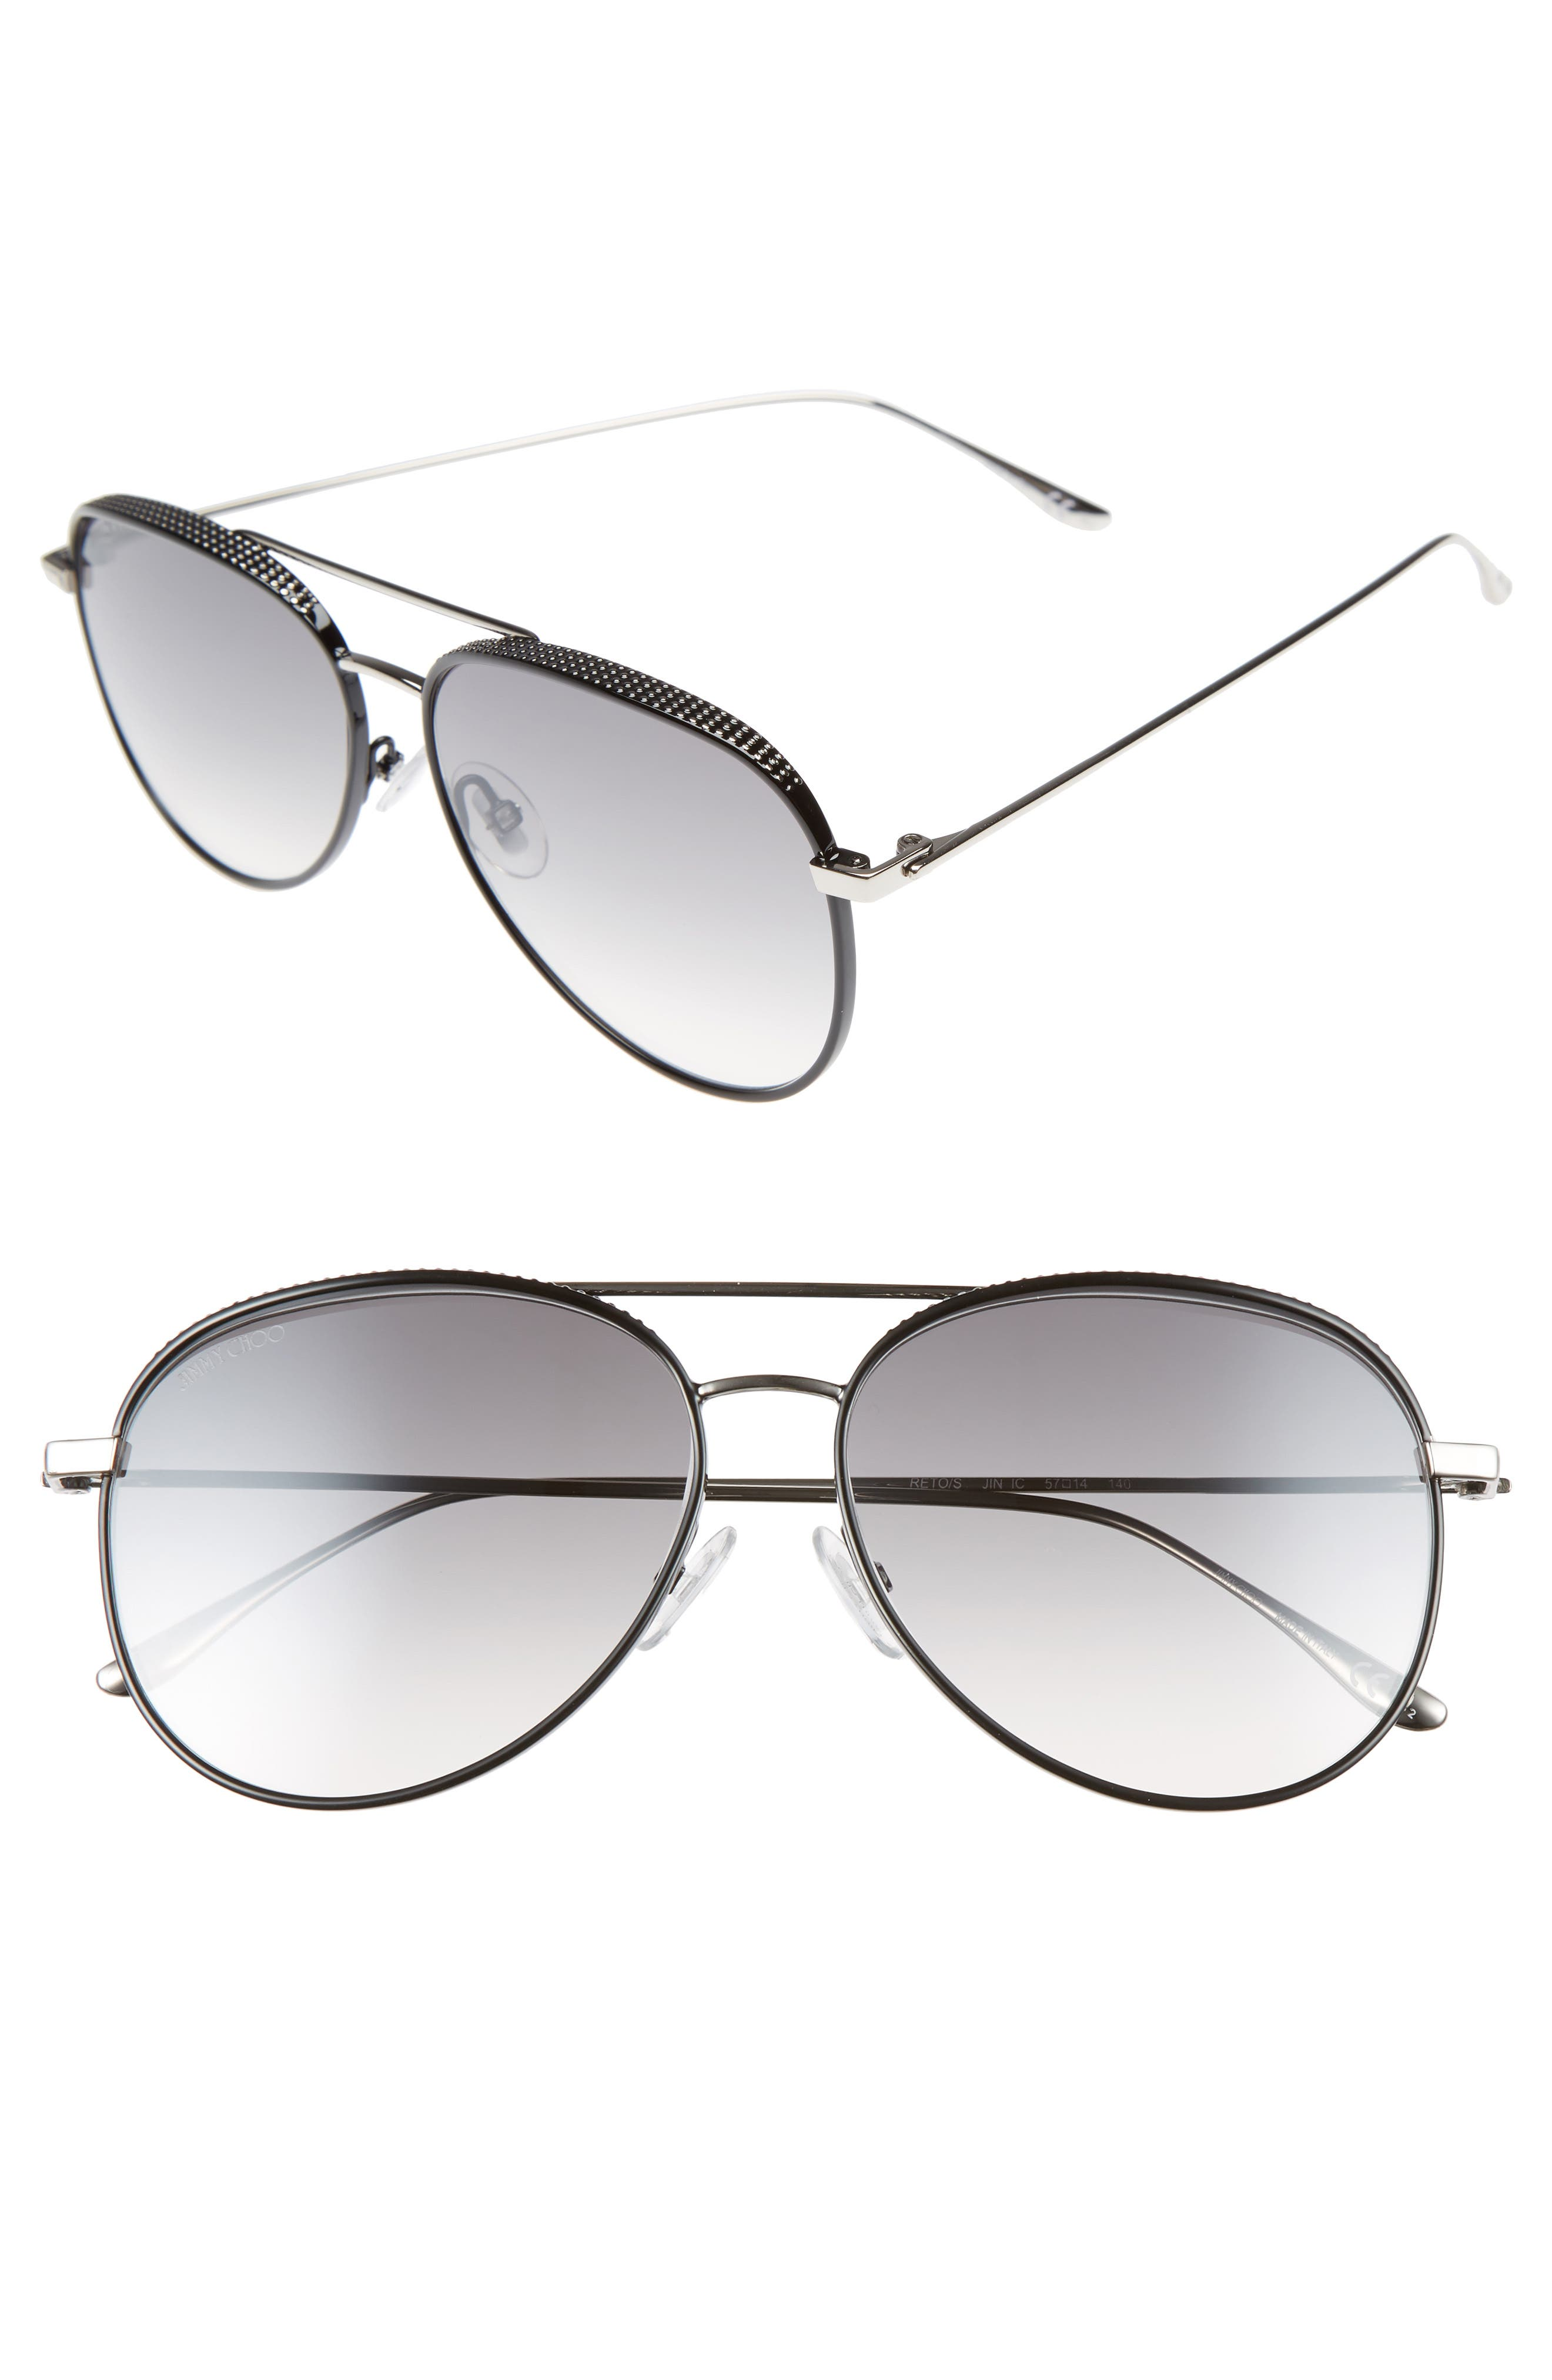 Reto 57mm Sunglasses,                             Main thumbnail 1, color,                             SHINY BLACK/ GREY SILVER